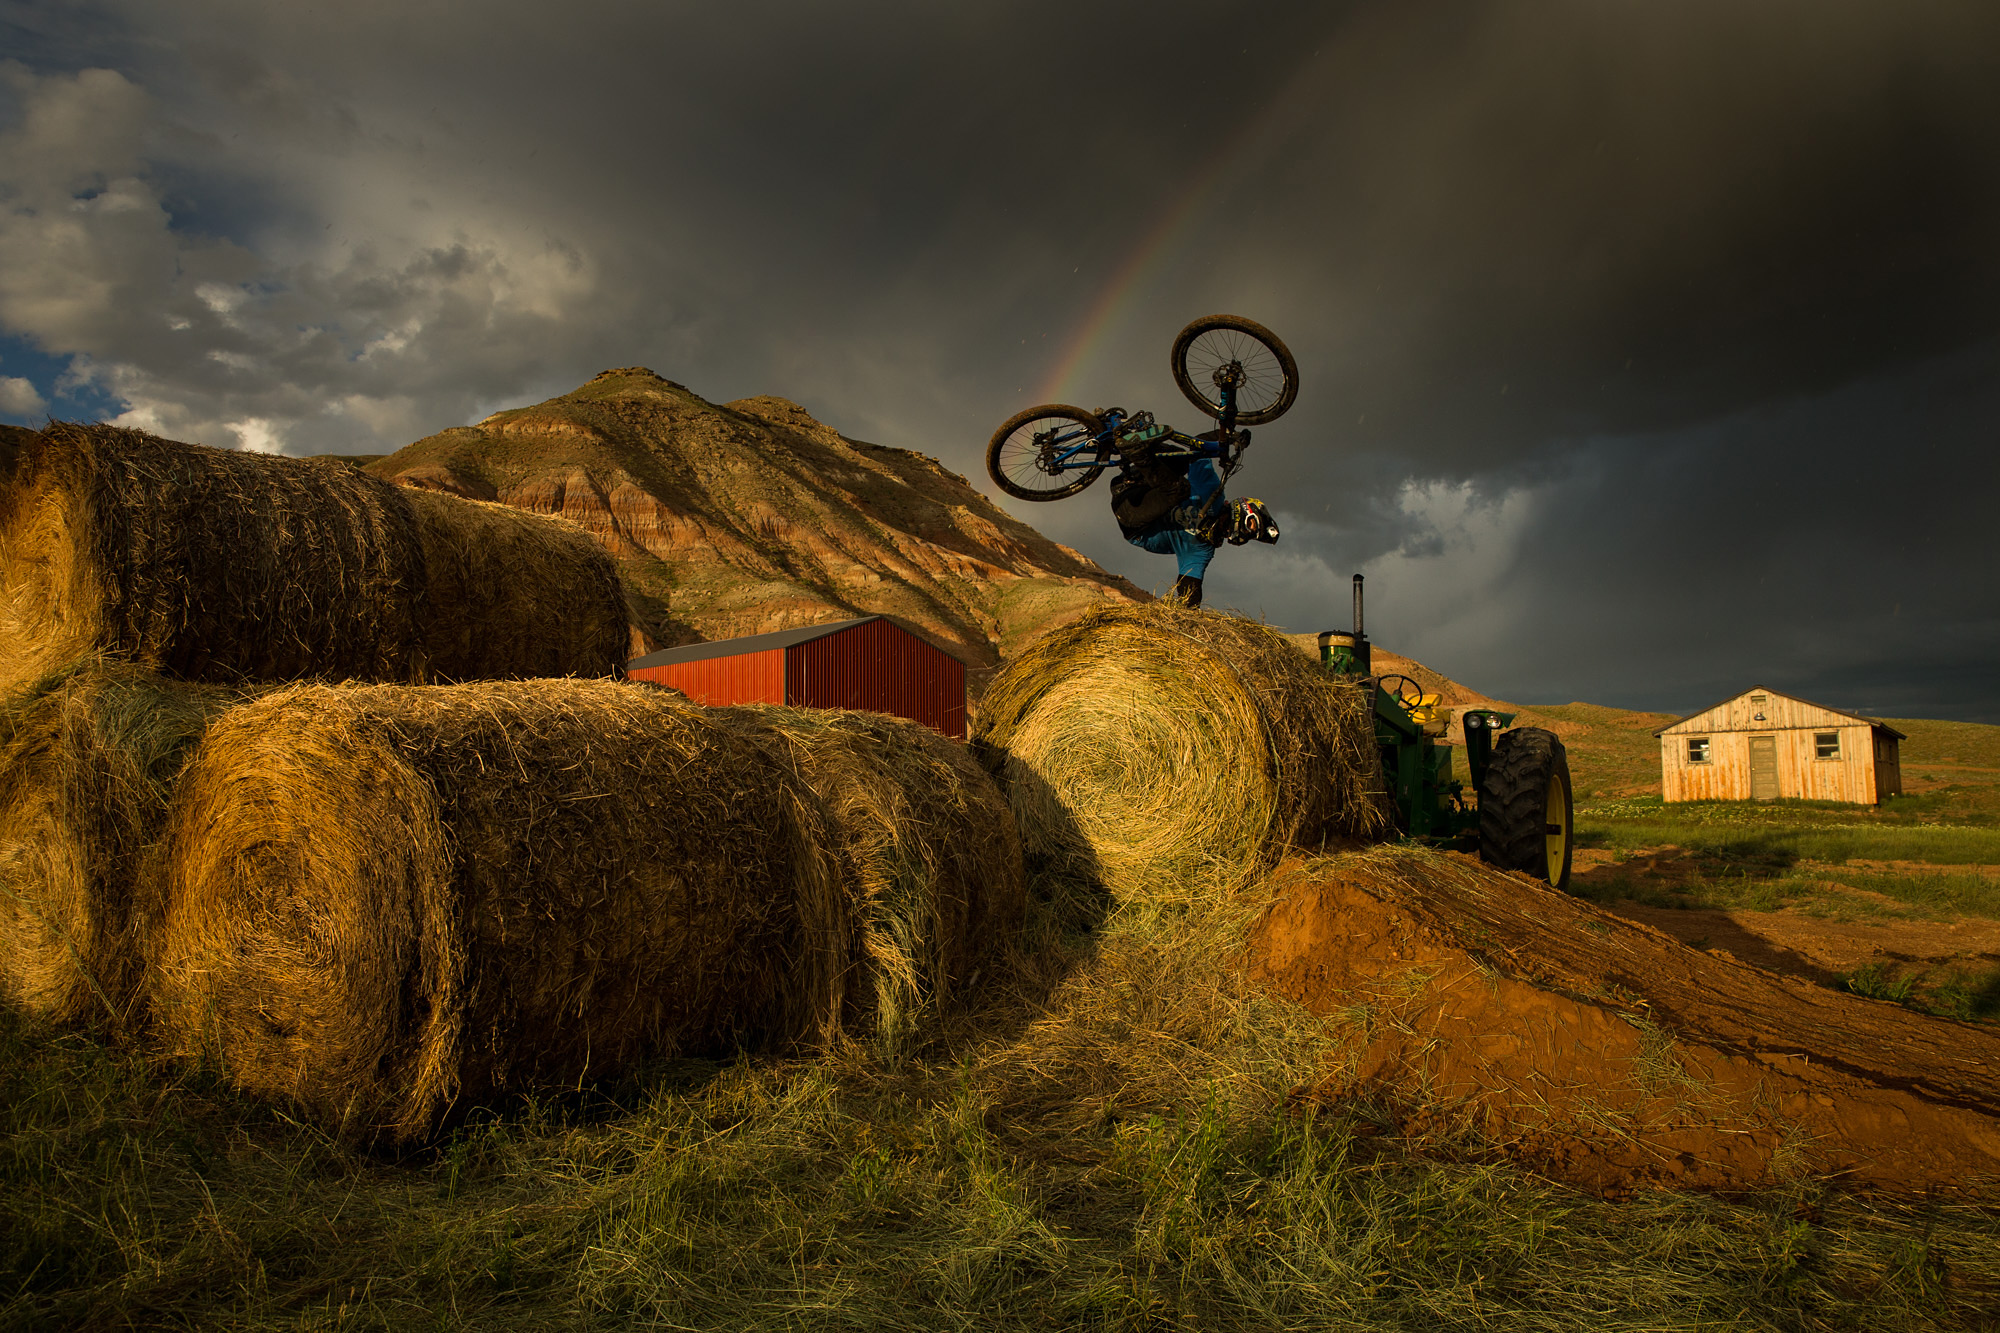 SLorencePhoto_RideMtns_007.JPG